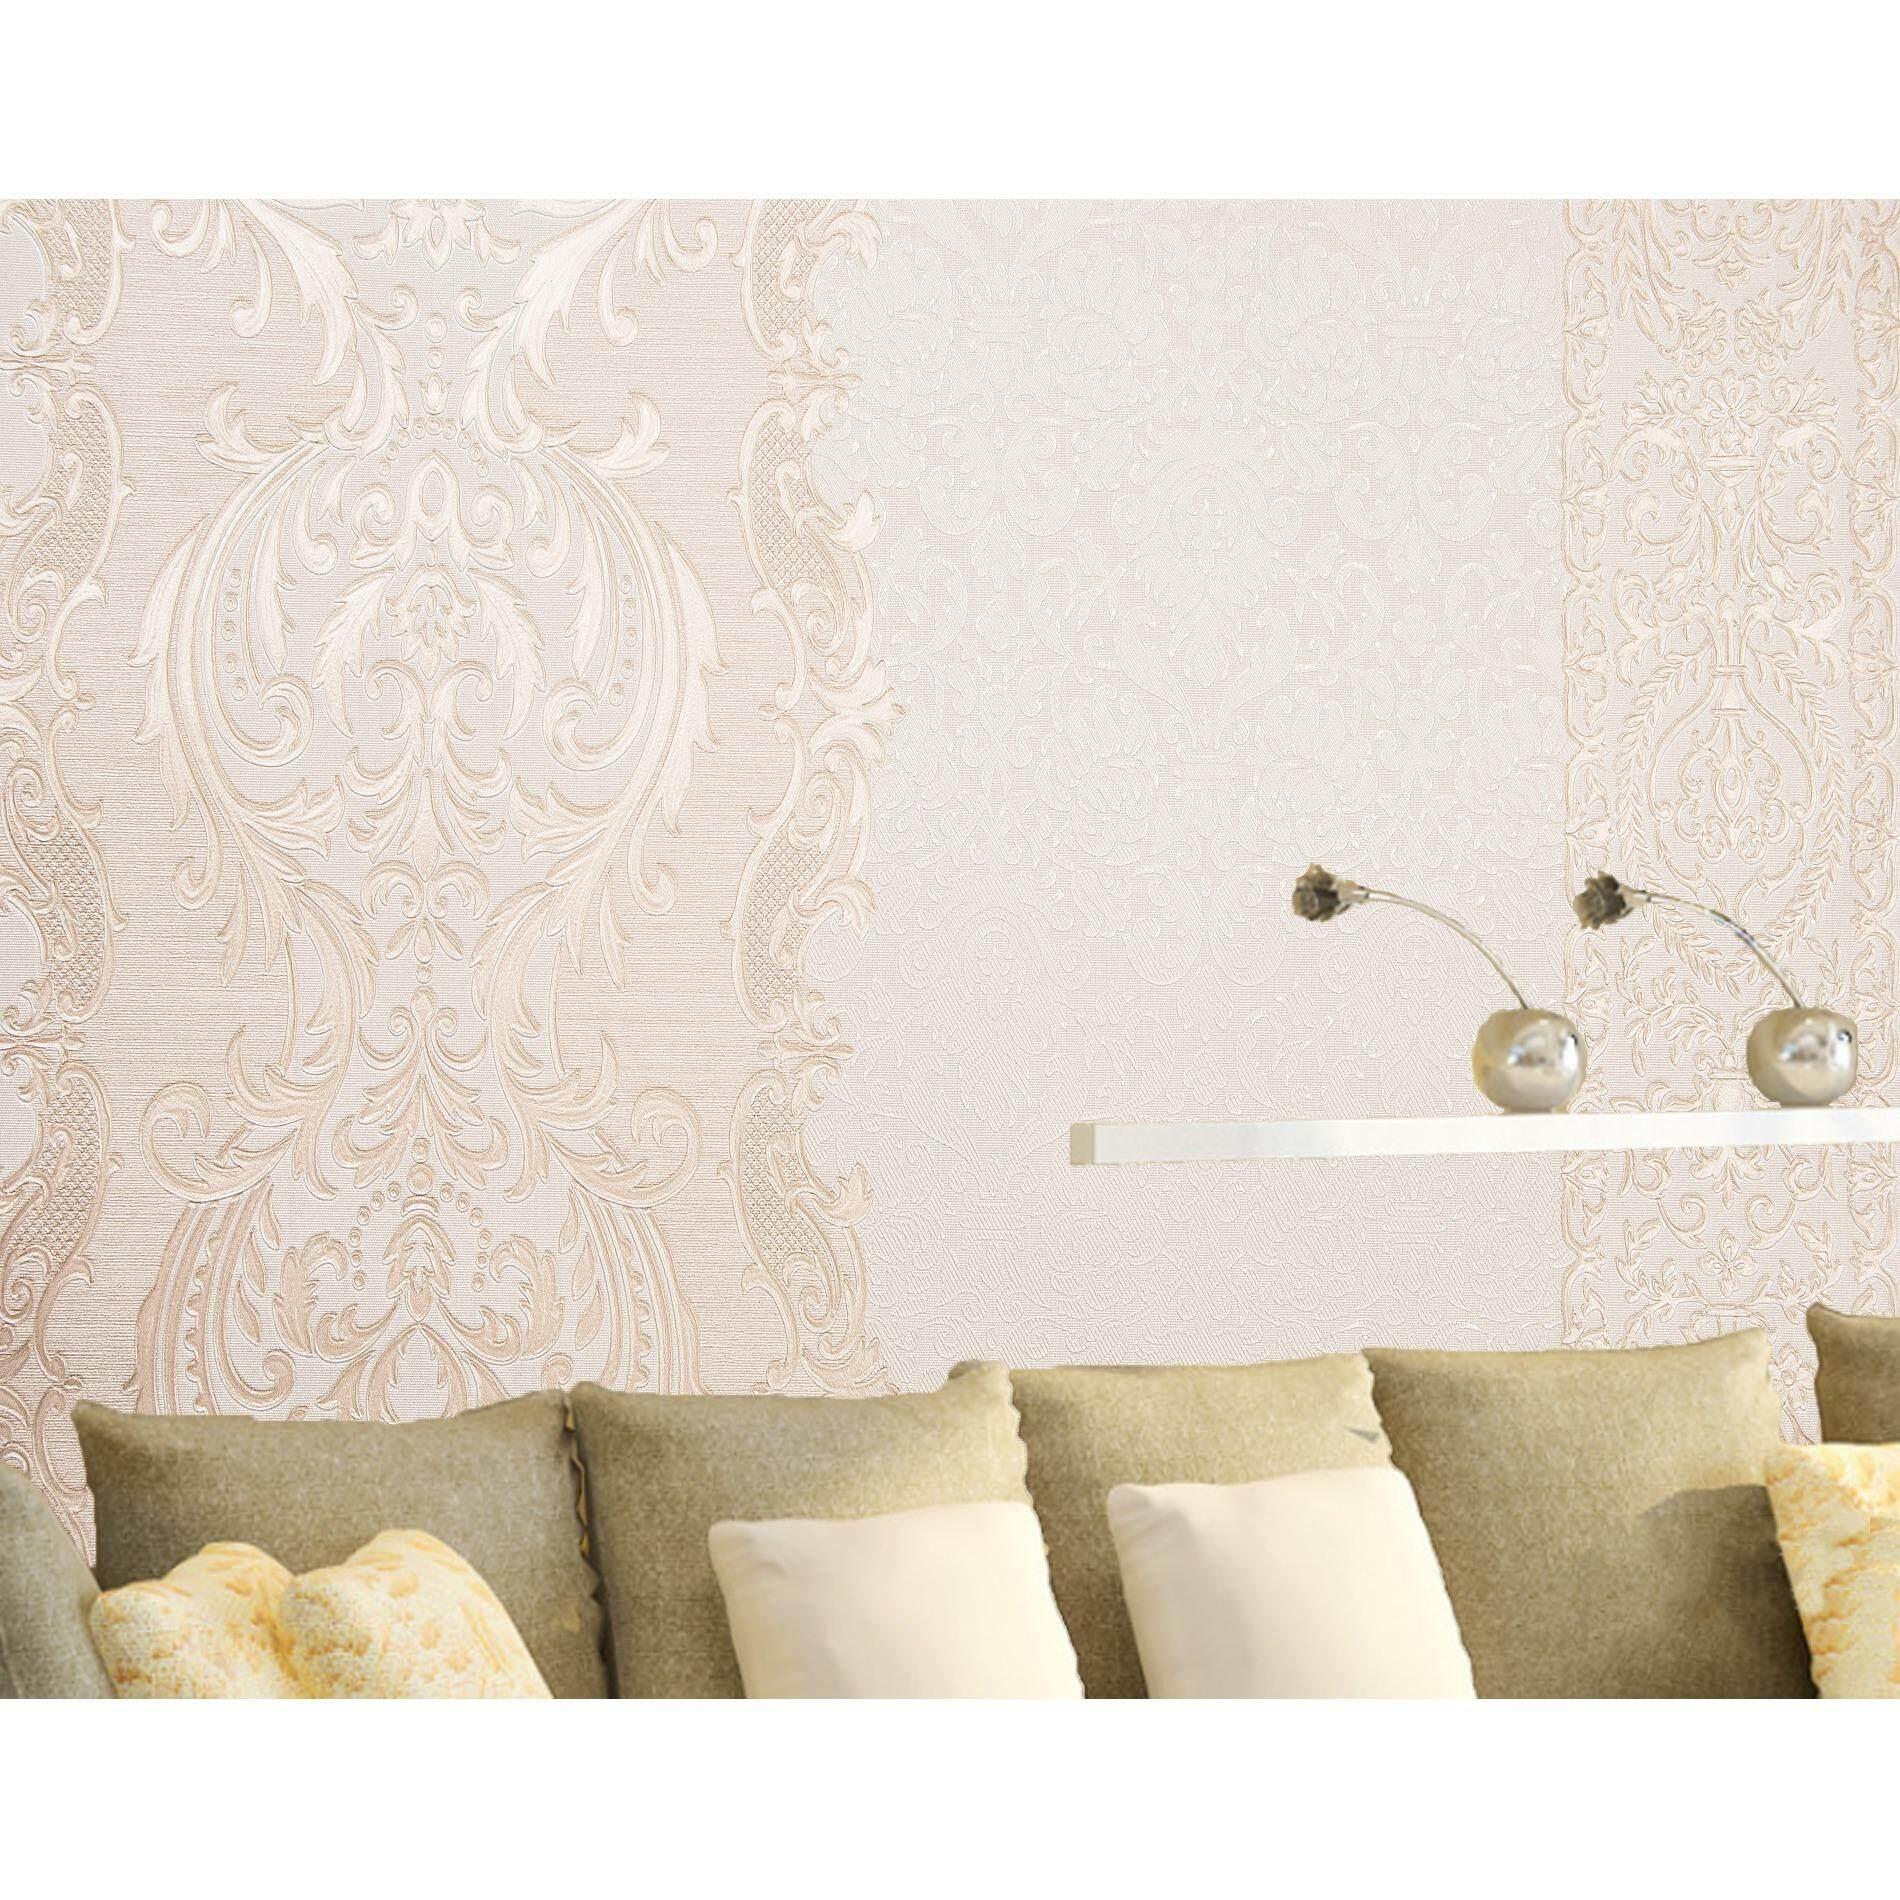 Homily Wallpaper Lxr รุ่น Pr 940103 โทนสีขาวมุก ลายดอกไม้ทองอ่อน ถูก